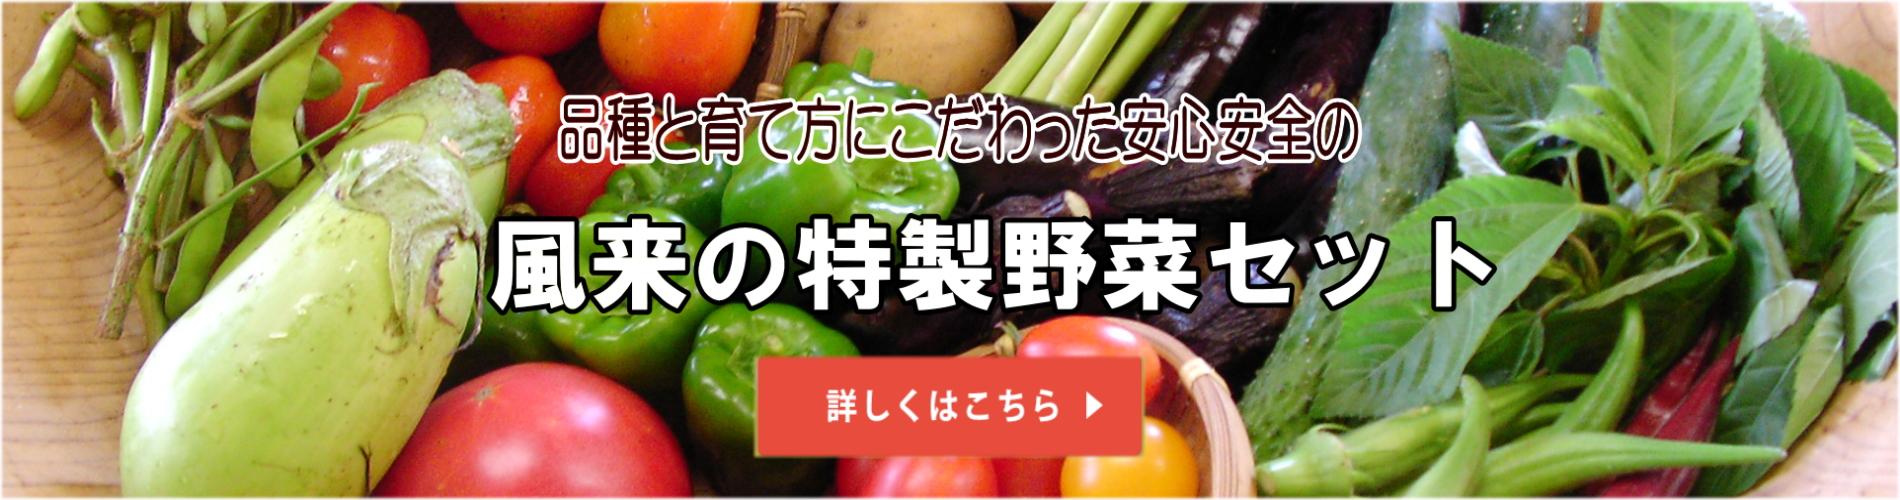 無農薬ハーブ苗・野菜苗